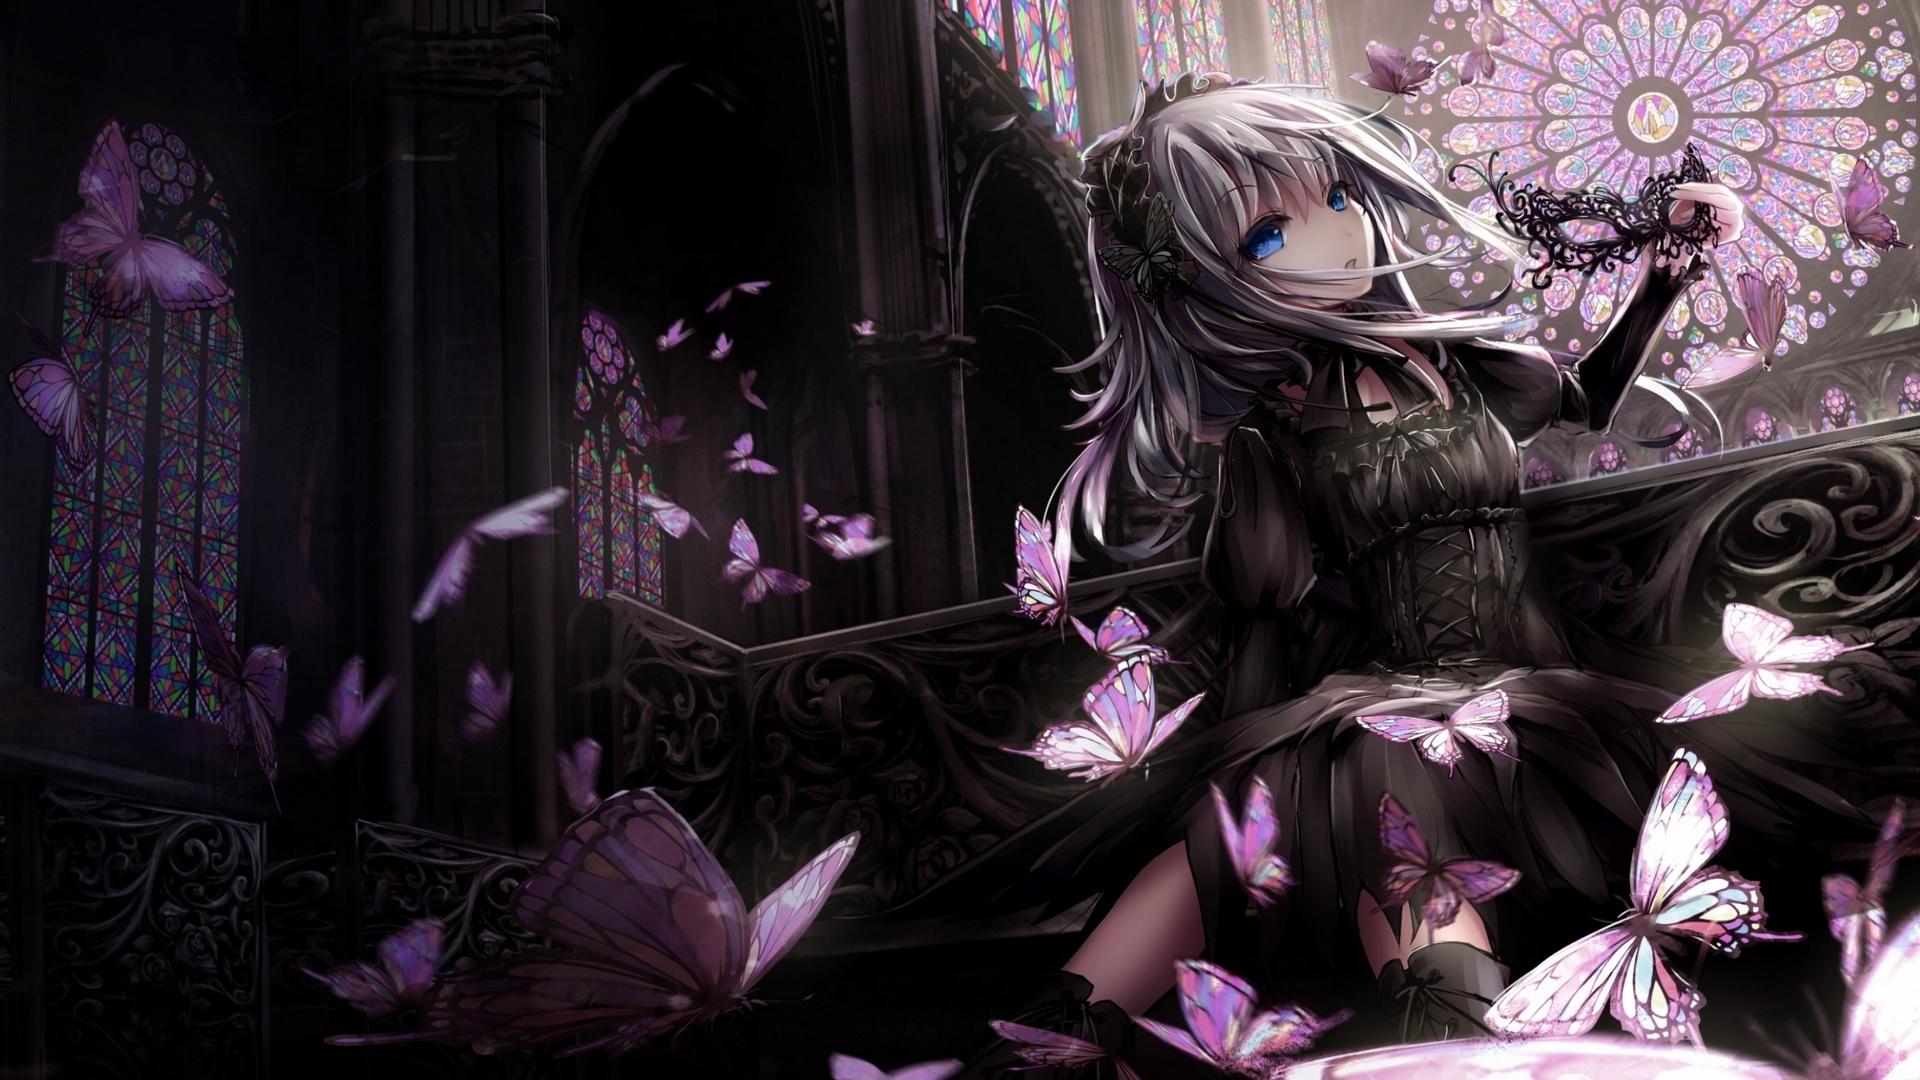 Anime Gothic Girl windows background